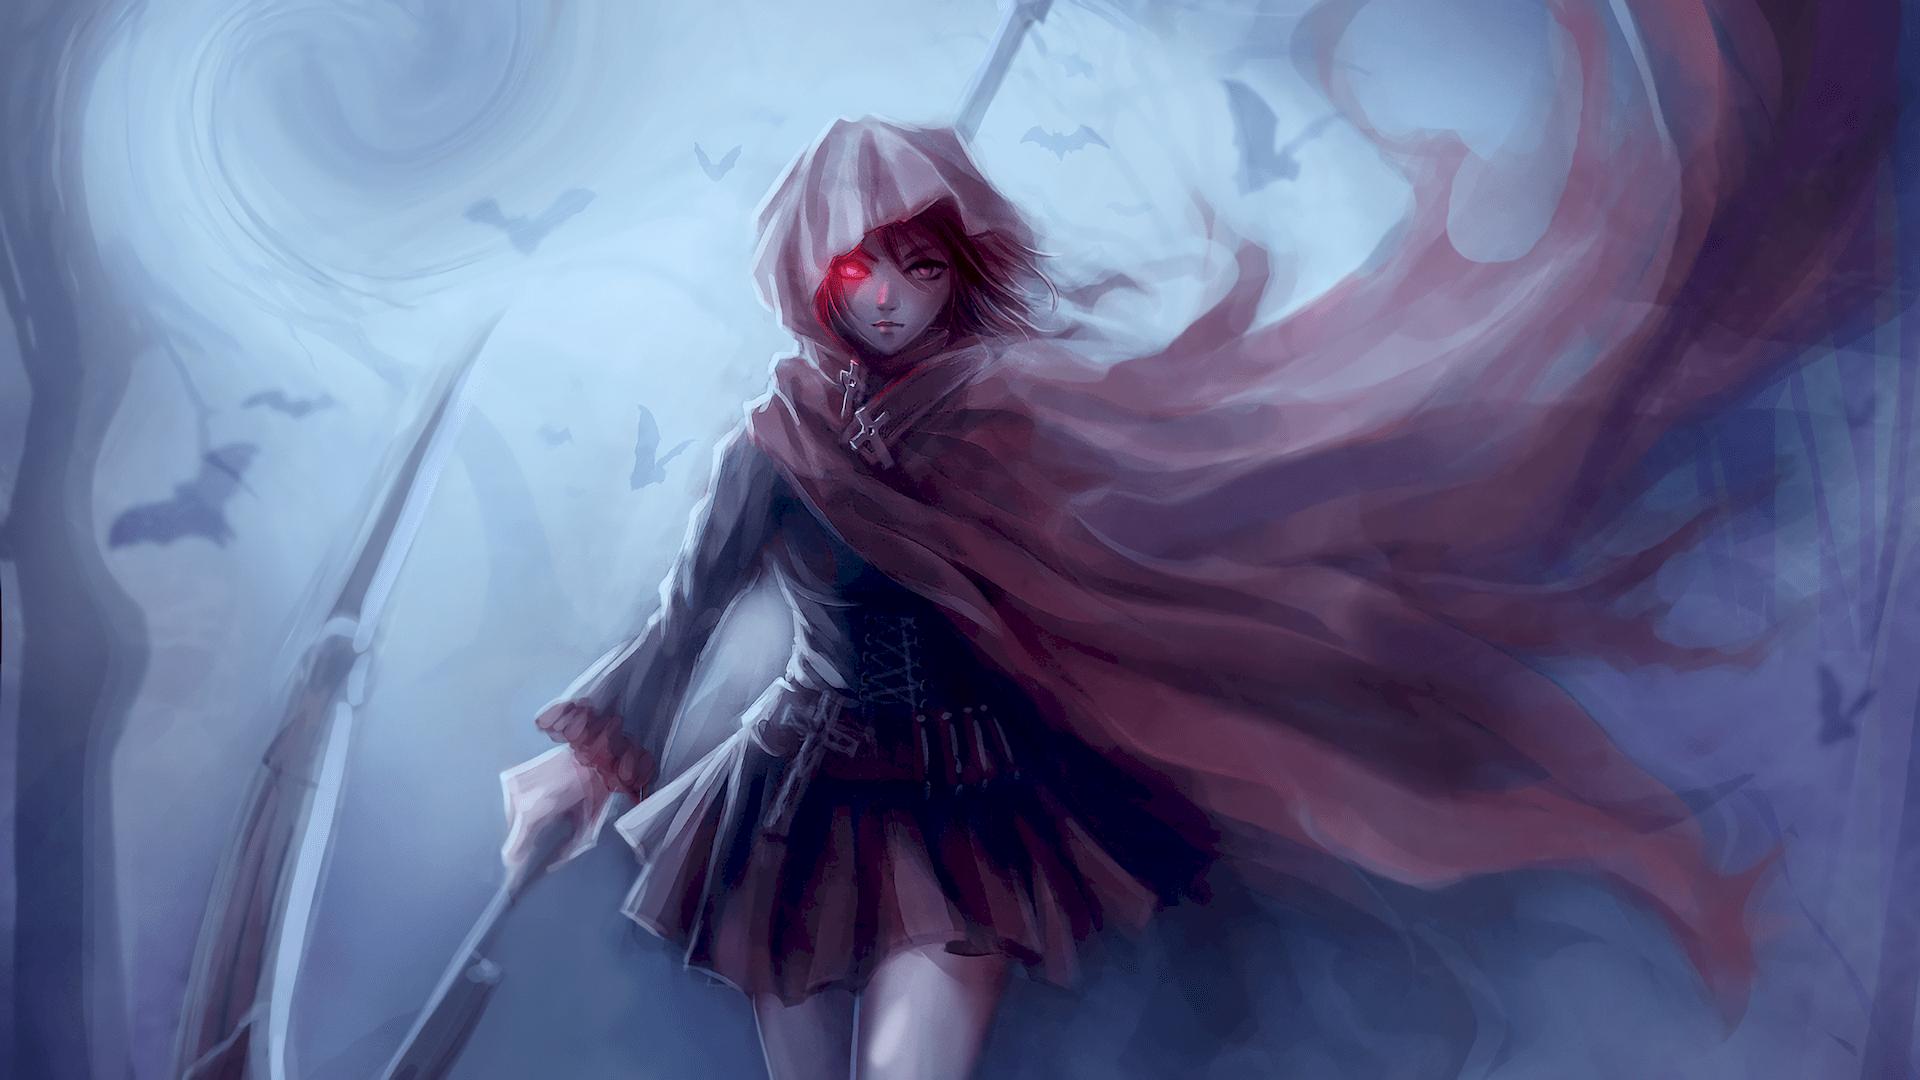 Manga Girl Wallpaper 1 Epic Heroes Beautiful 27 x HD